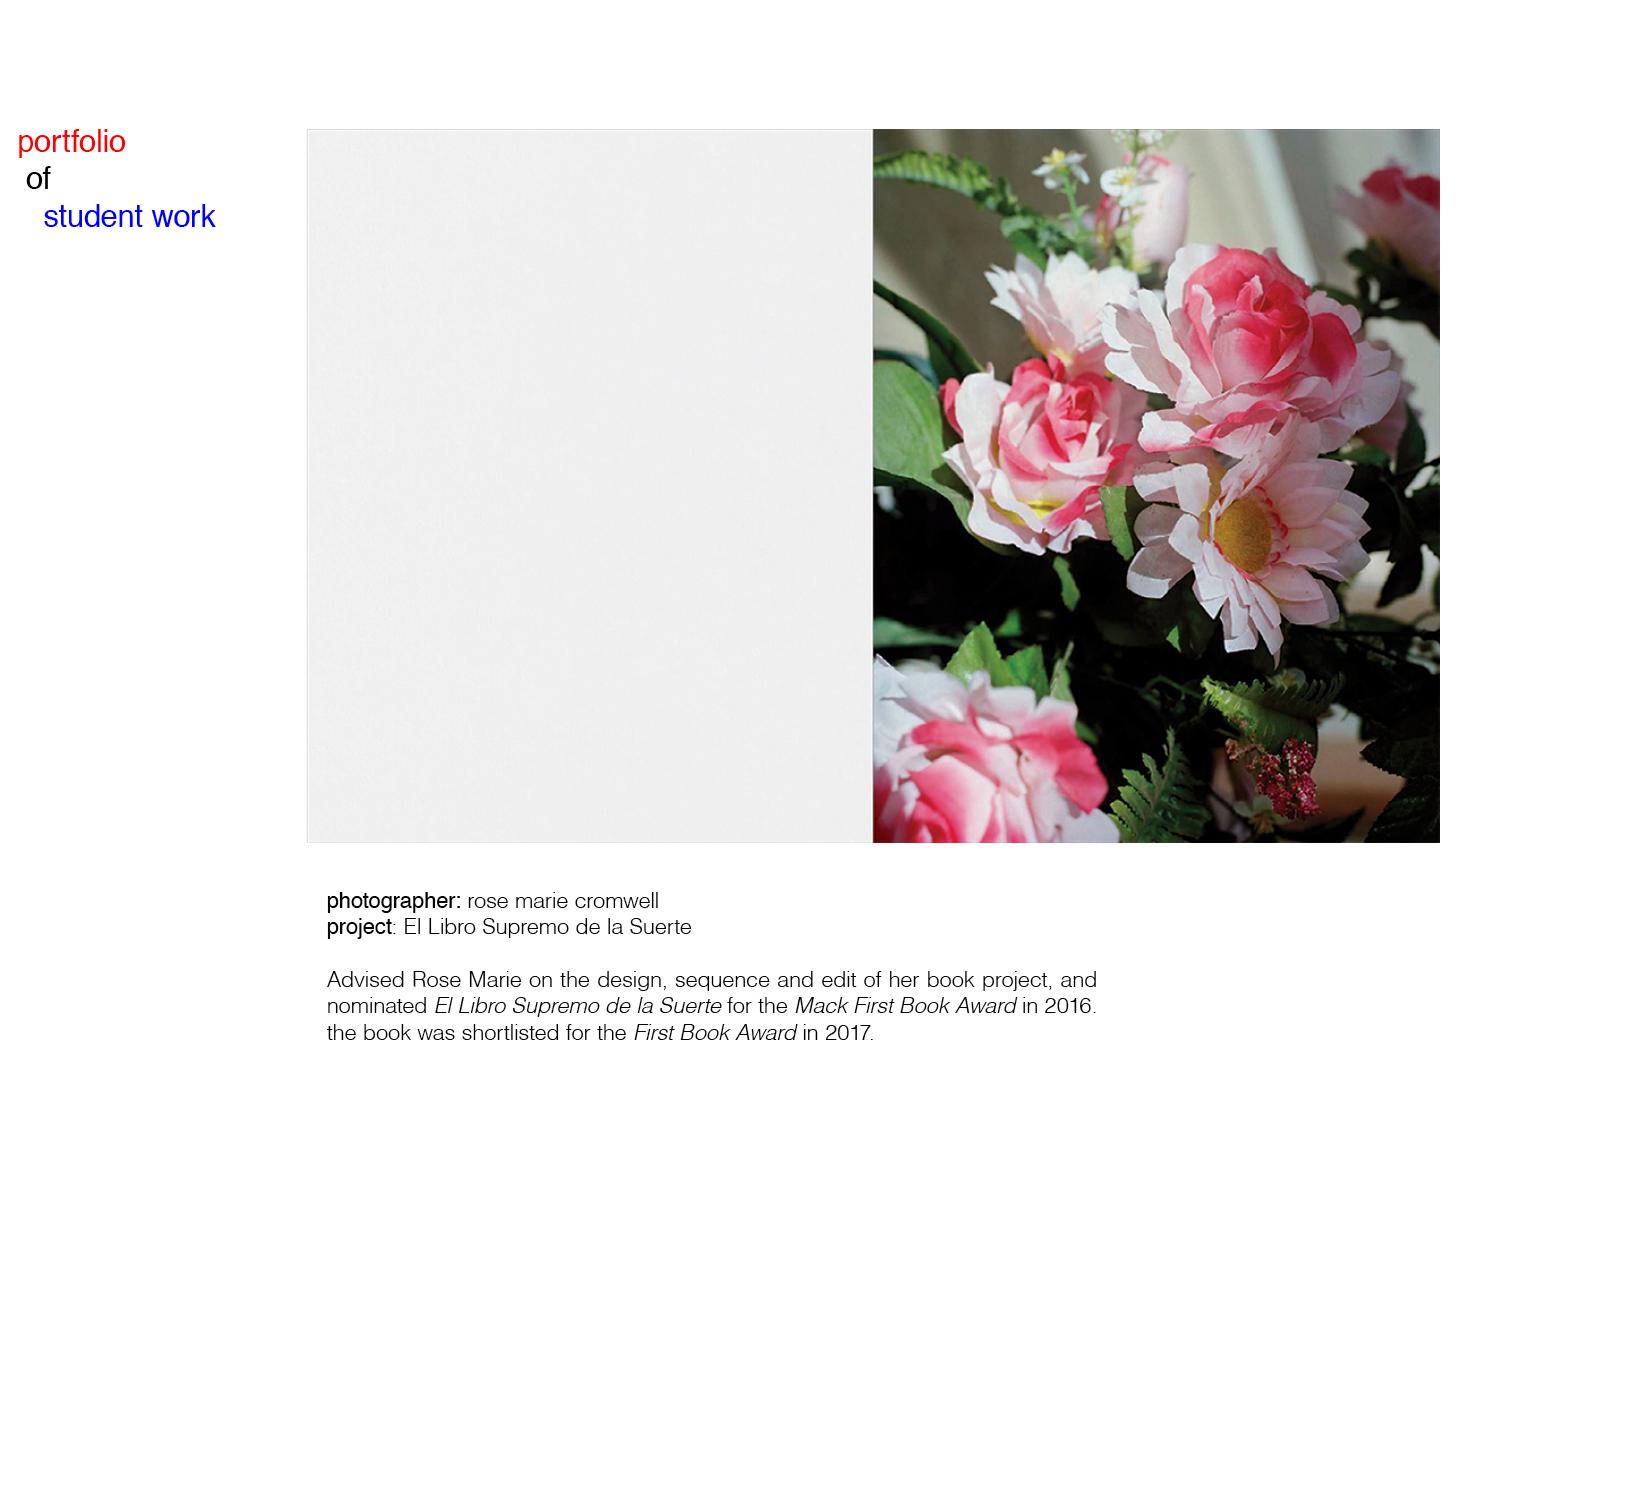 RMC_book_01.jpg